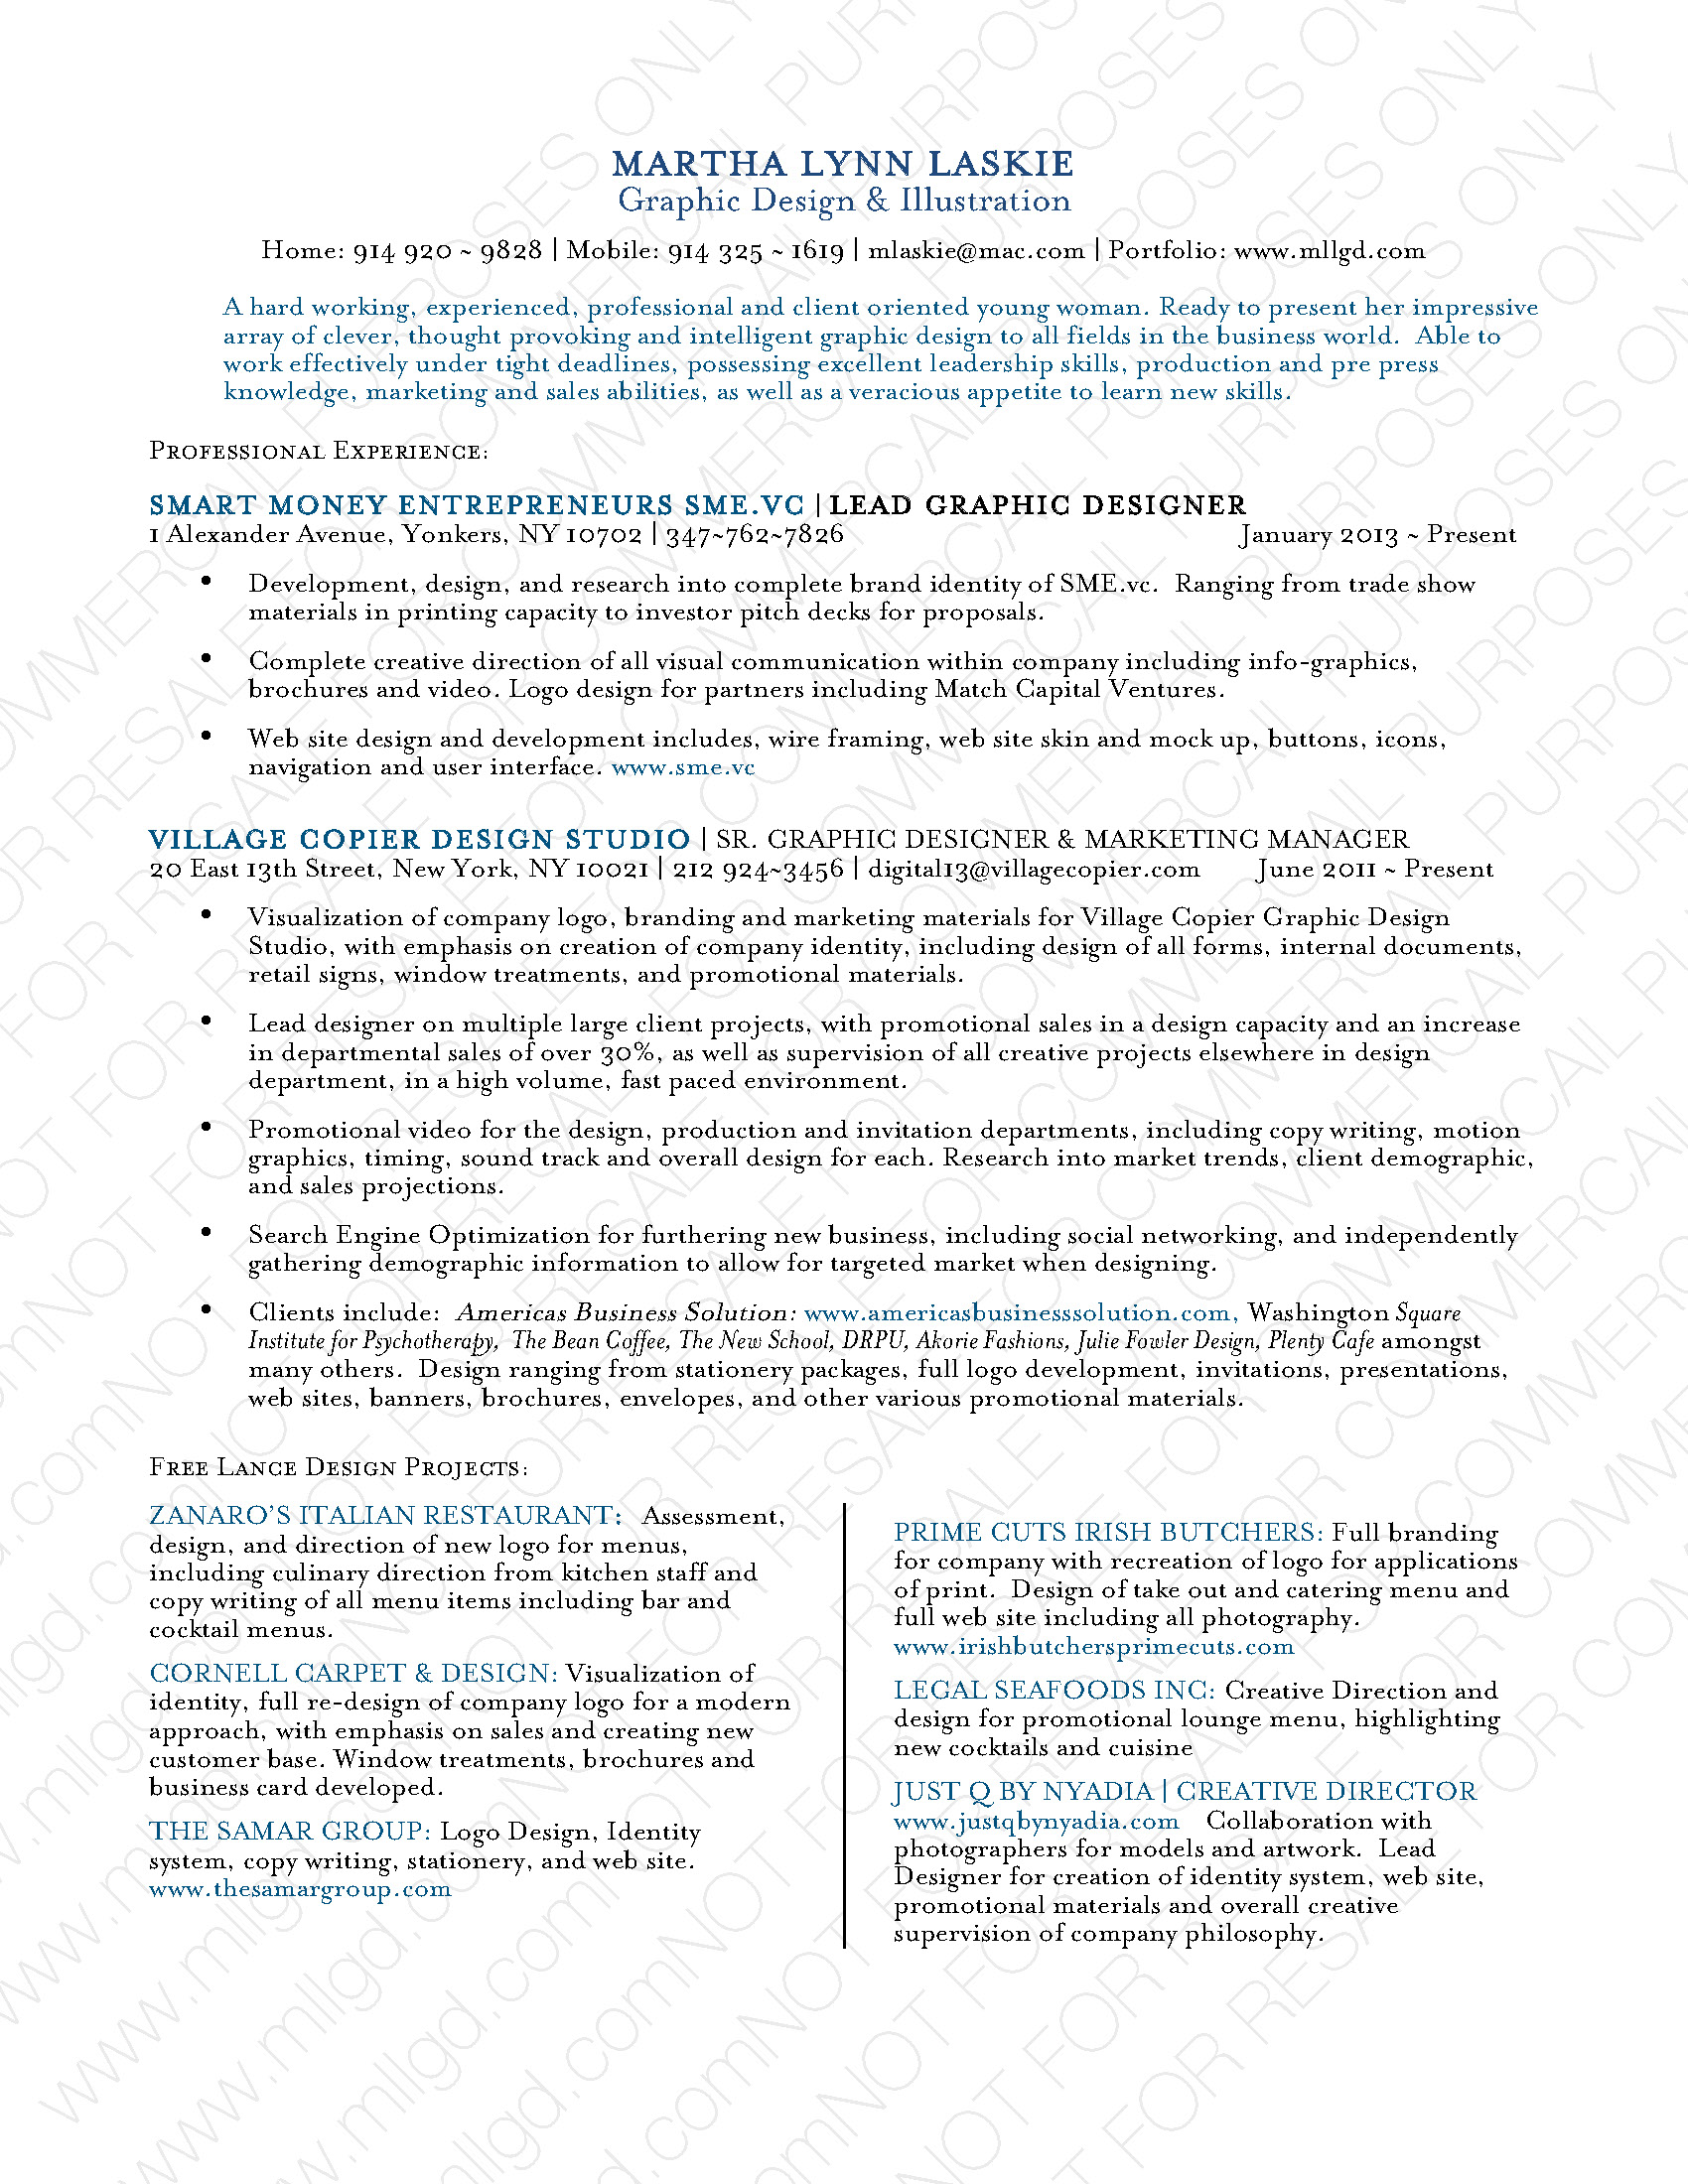 MLL_Resume_Design_2014_Page_43.jpg